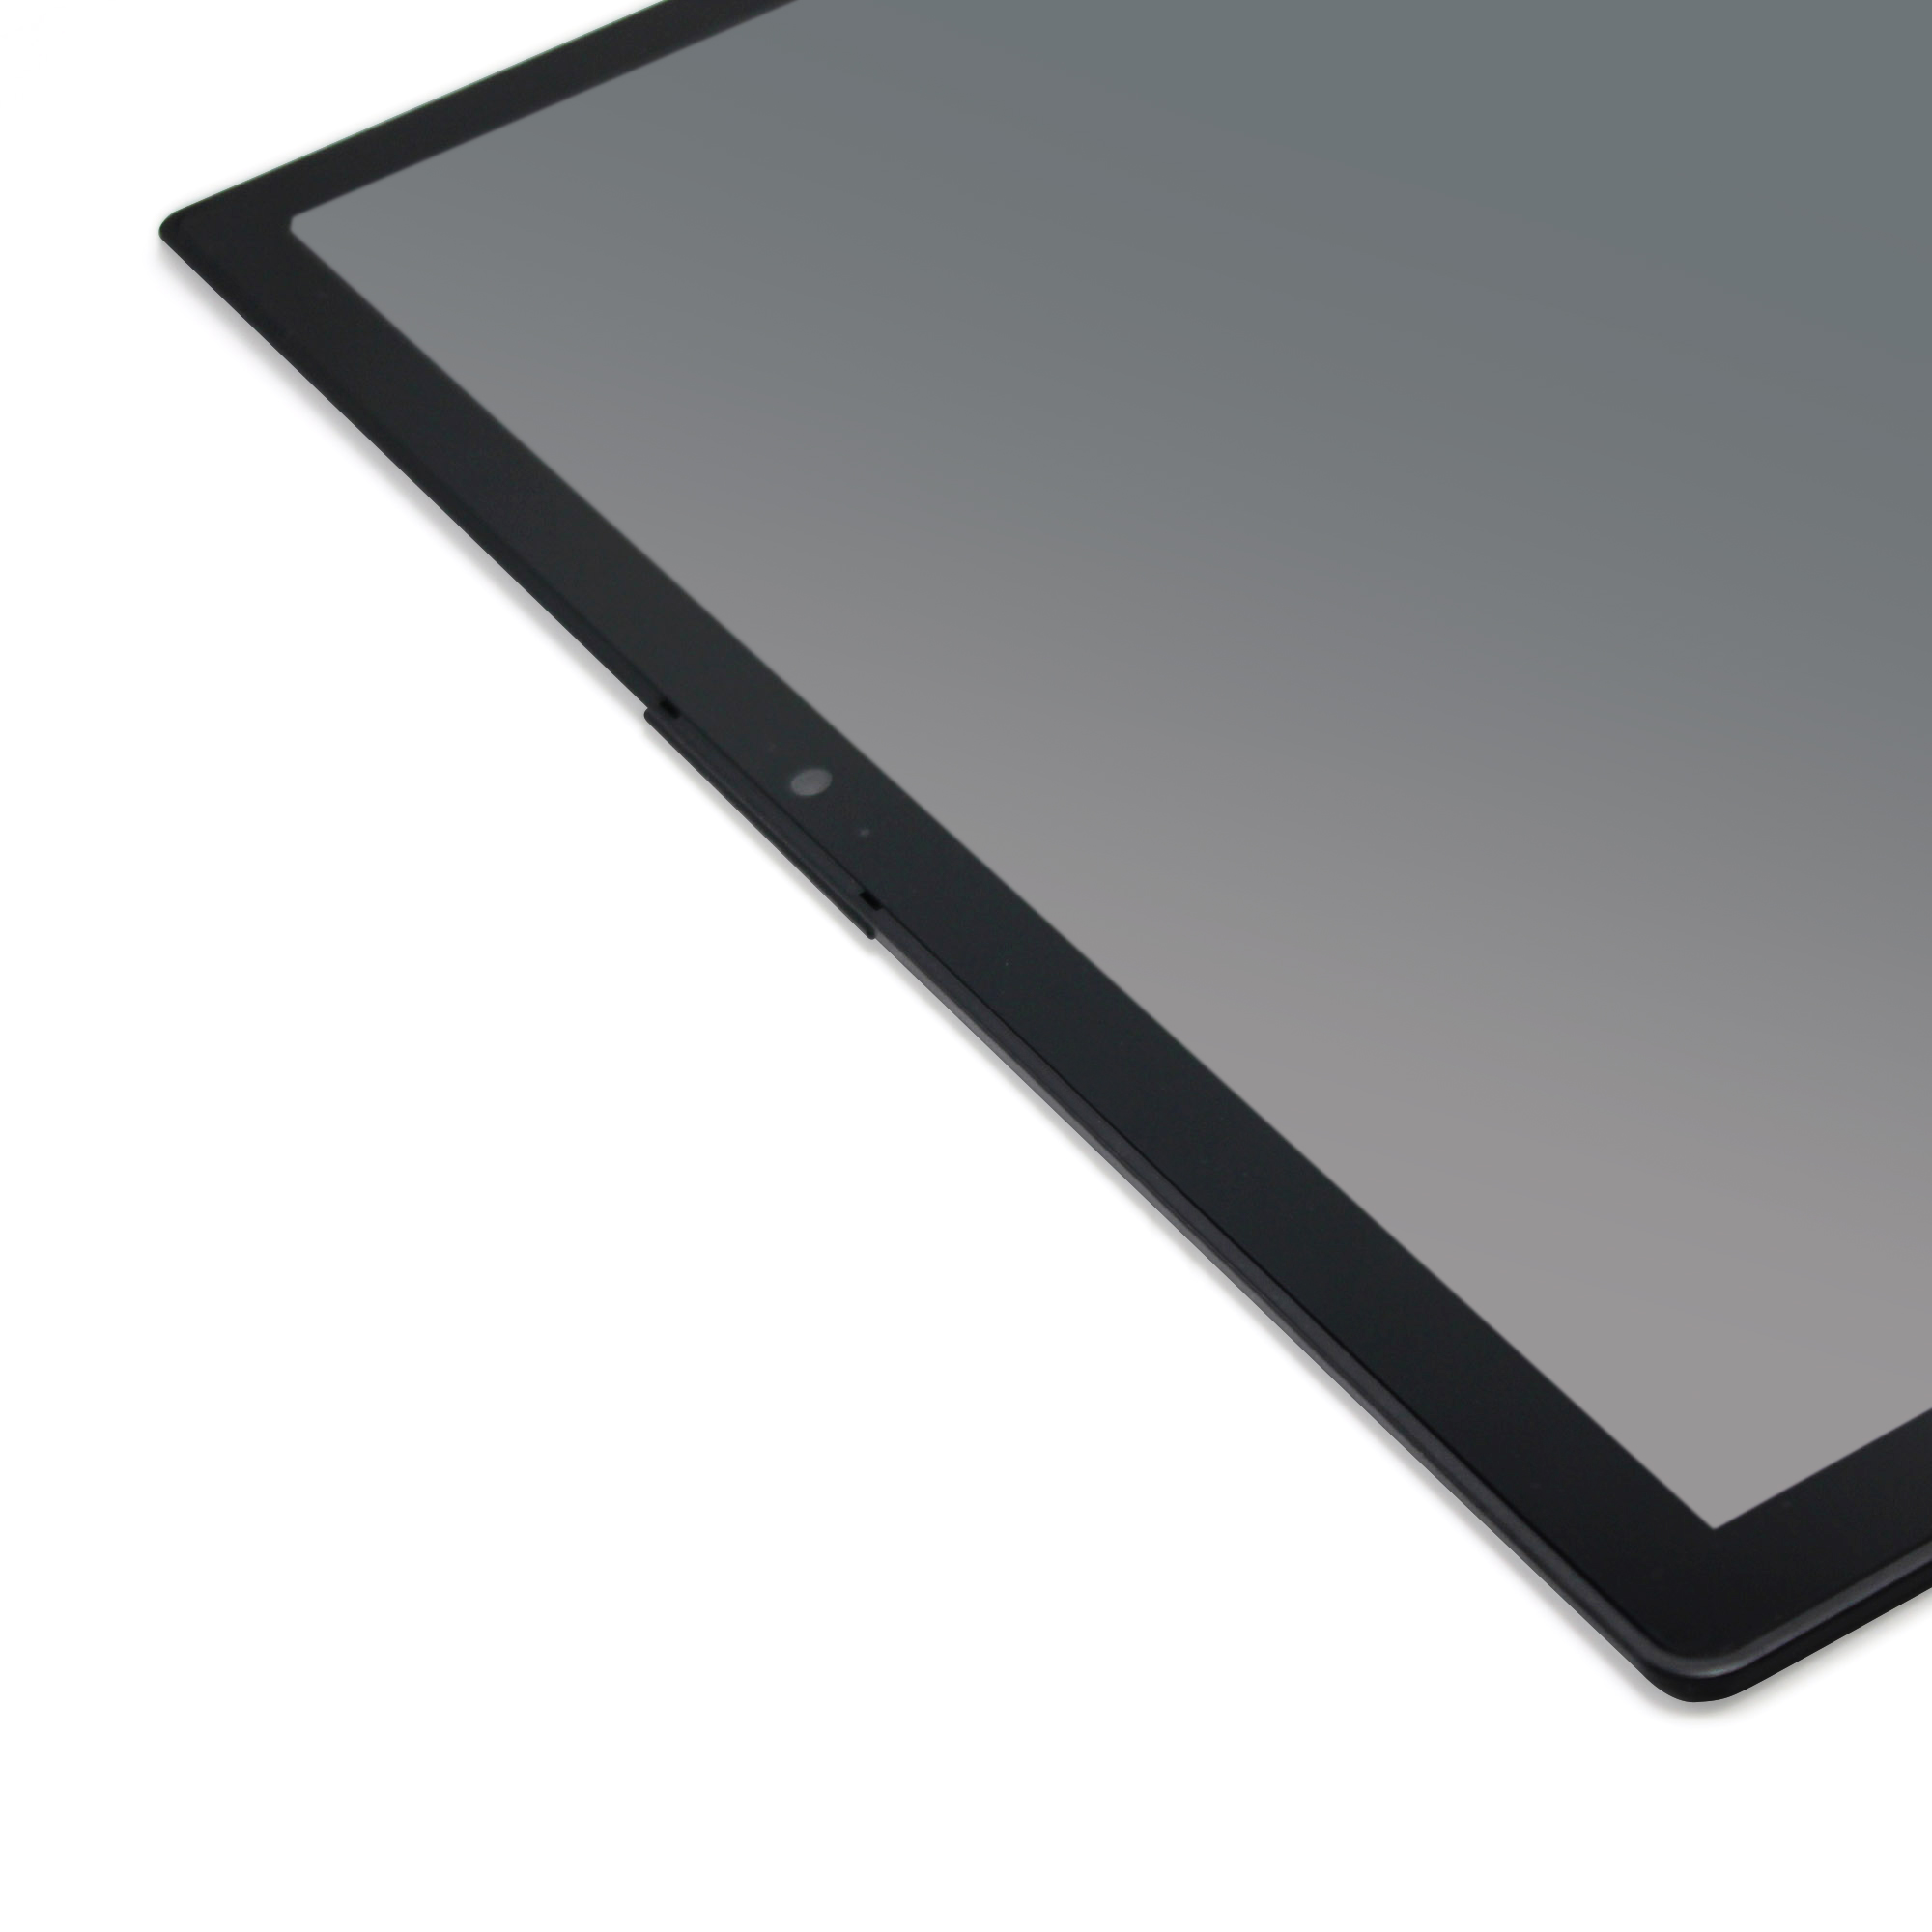 For Toshiba Satellite Radius P55W-B Series P55W-B5318 P55W-B5162 Full LCD Screen Display Touch Glass Digitizer Assembly+Bezel